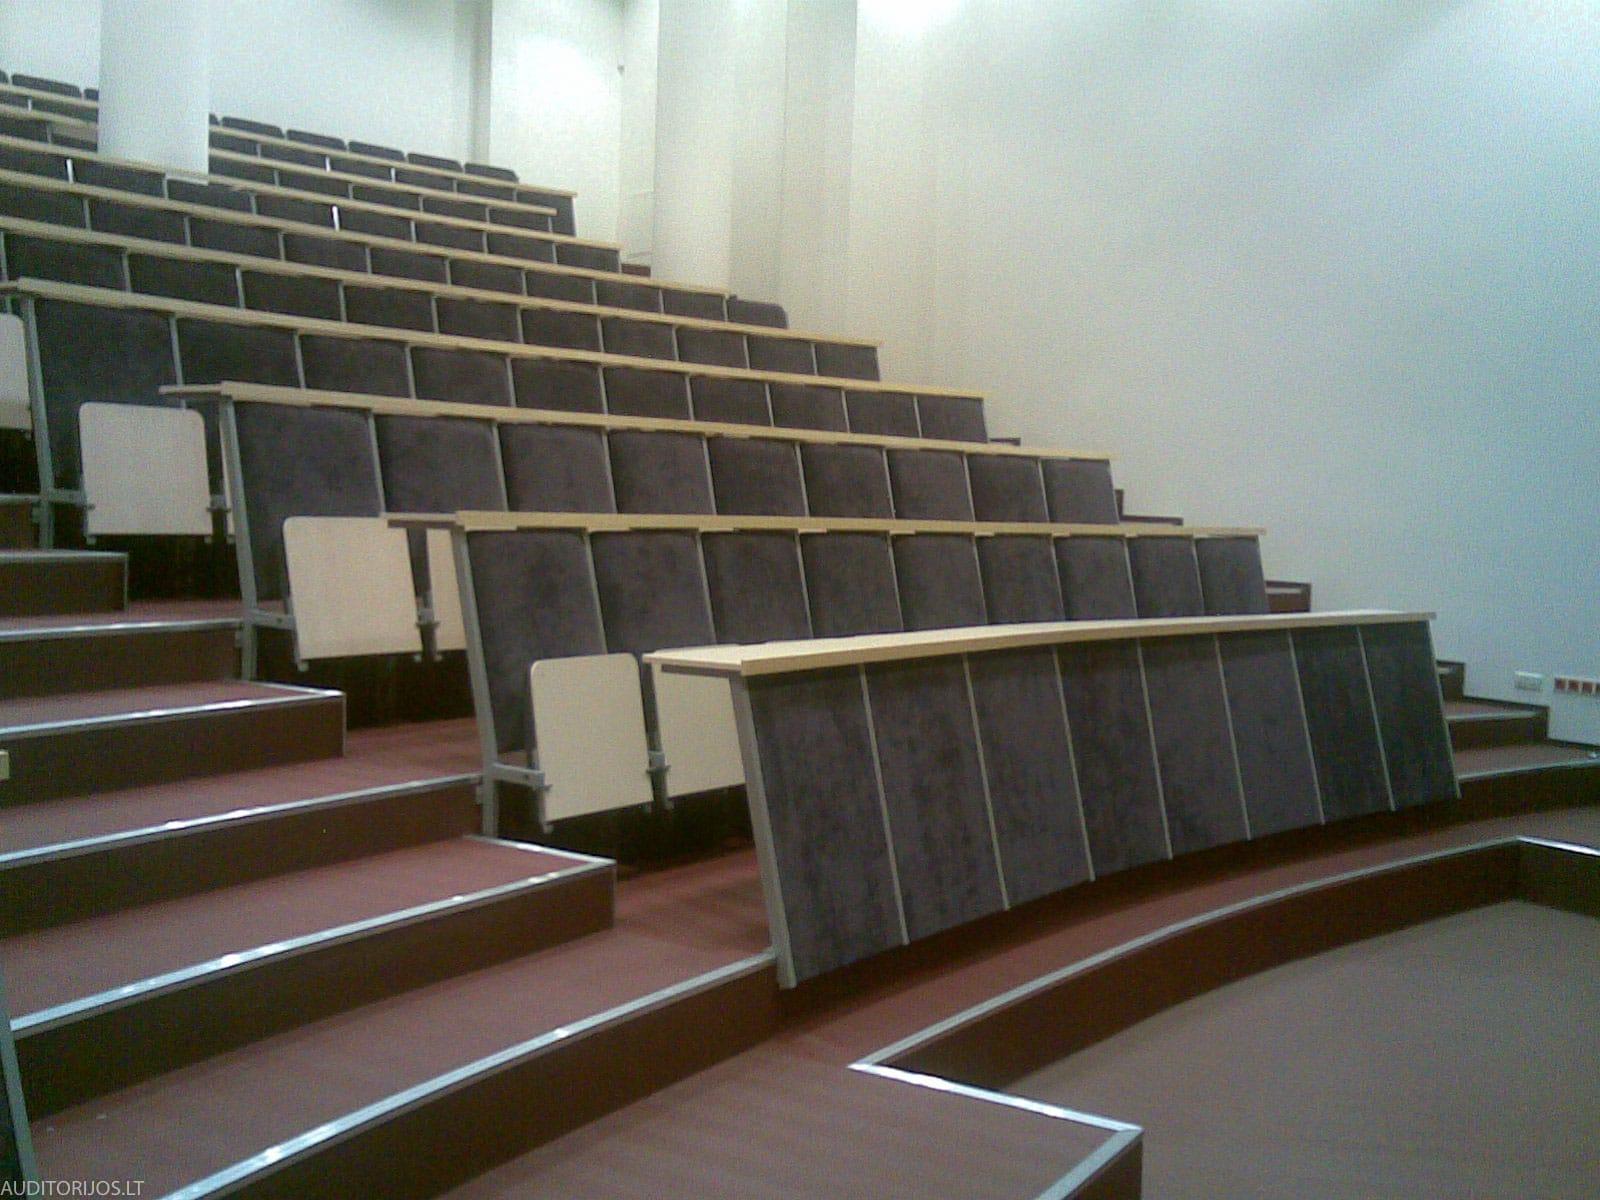 Mykolo Riomerio Universiteto Kedes 11102007